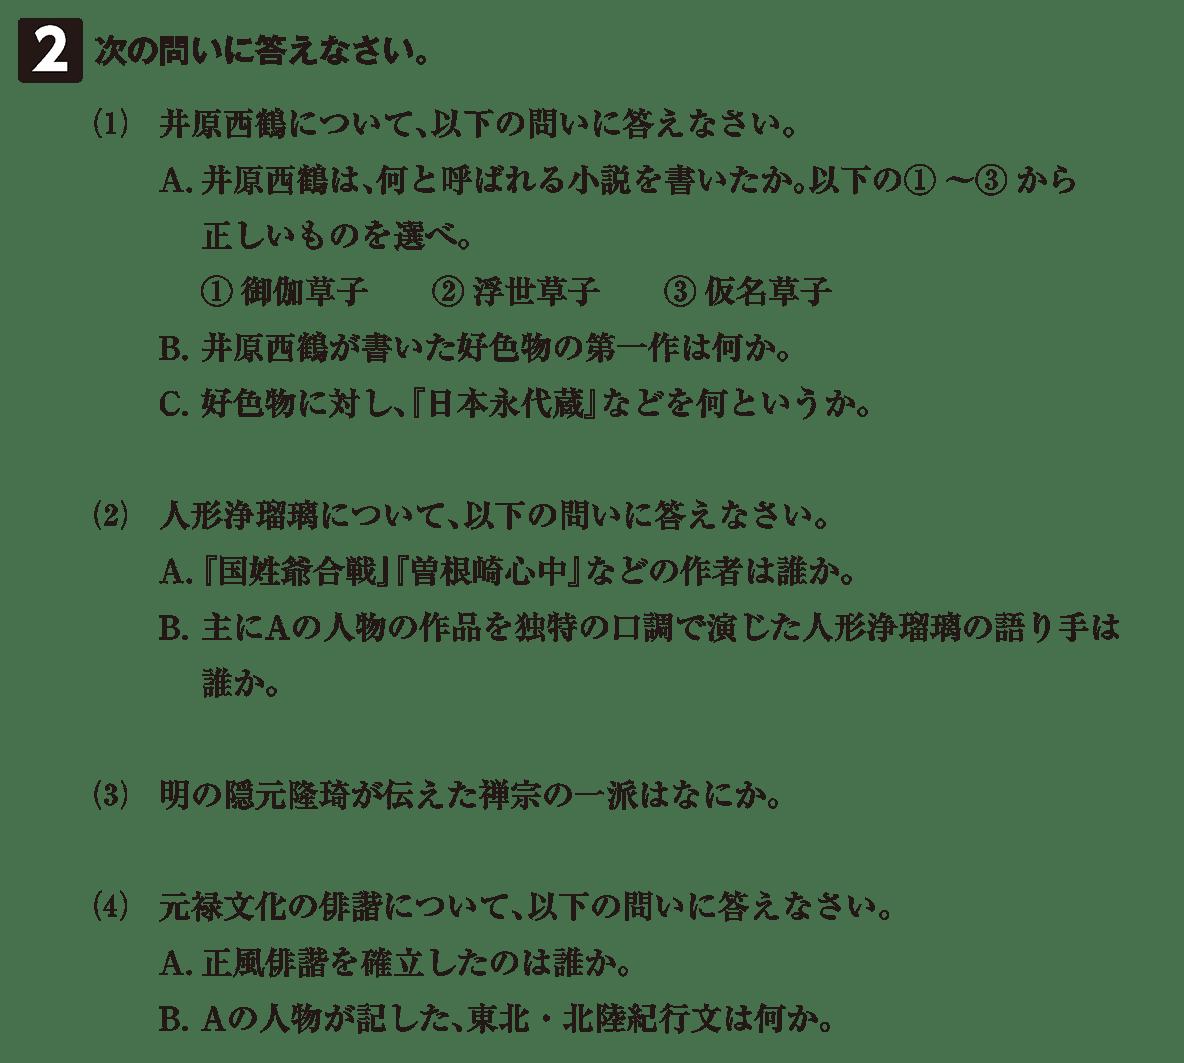 近世の文化12 問題2 問題